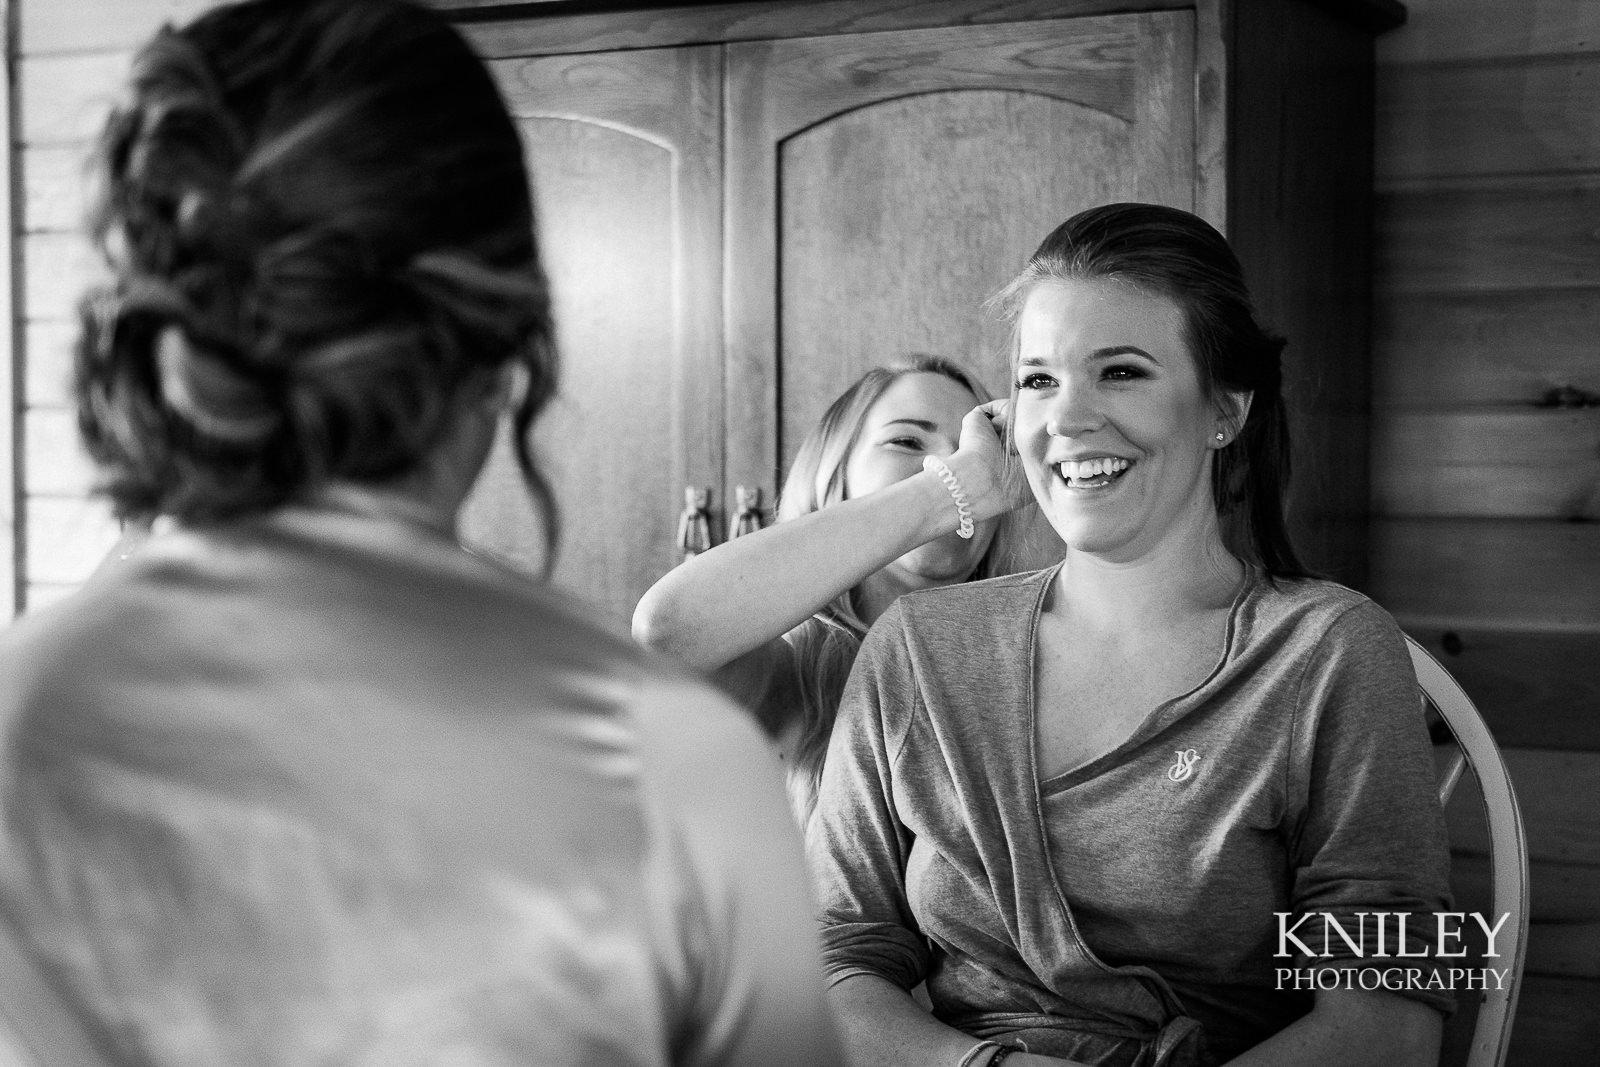 012 - Buffalo NY wedding - Preparation pictures - XT2B8171.jpg